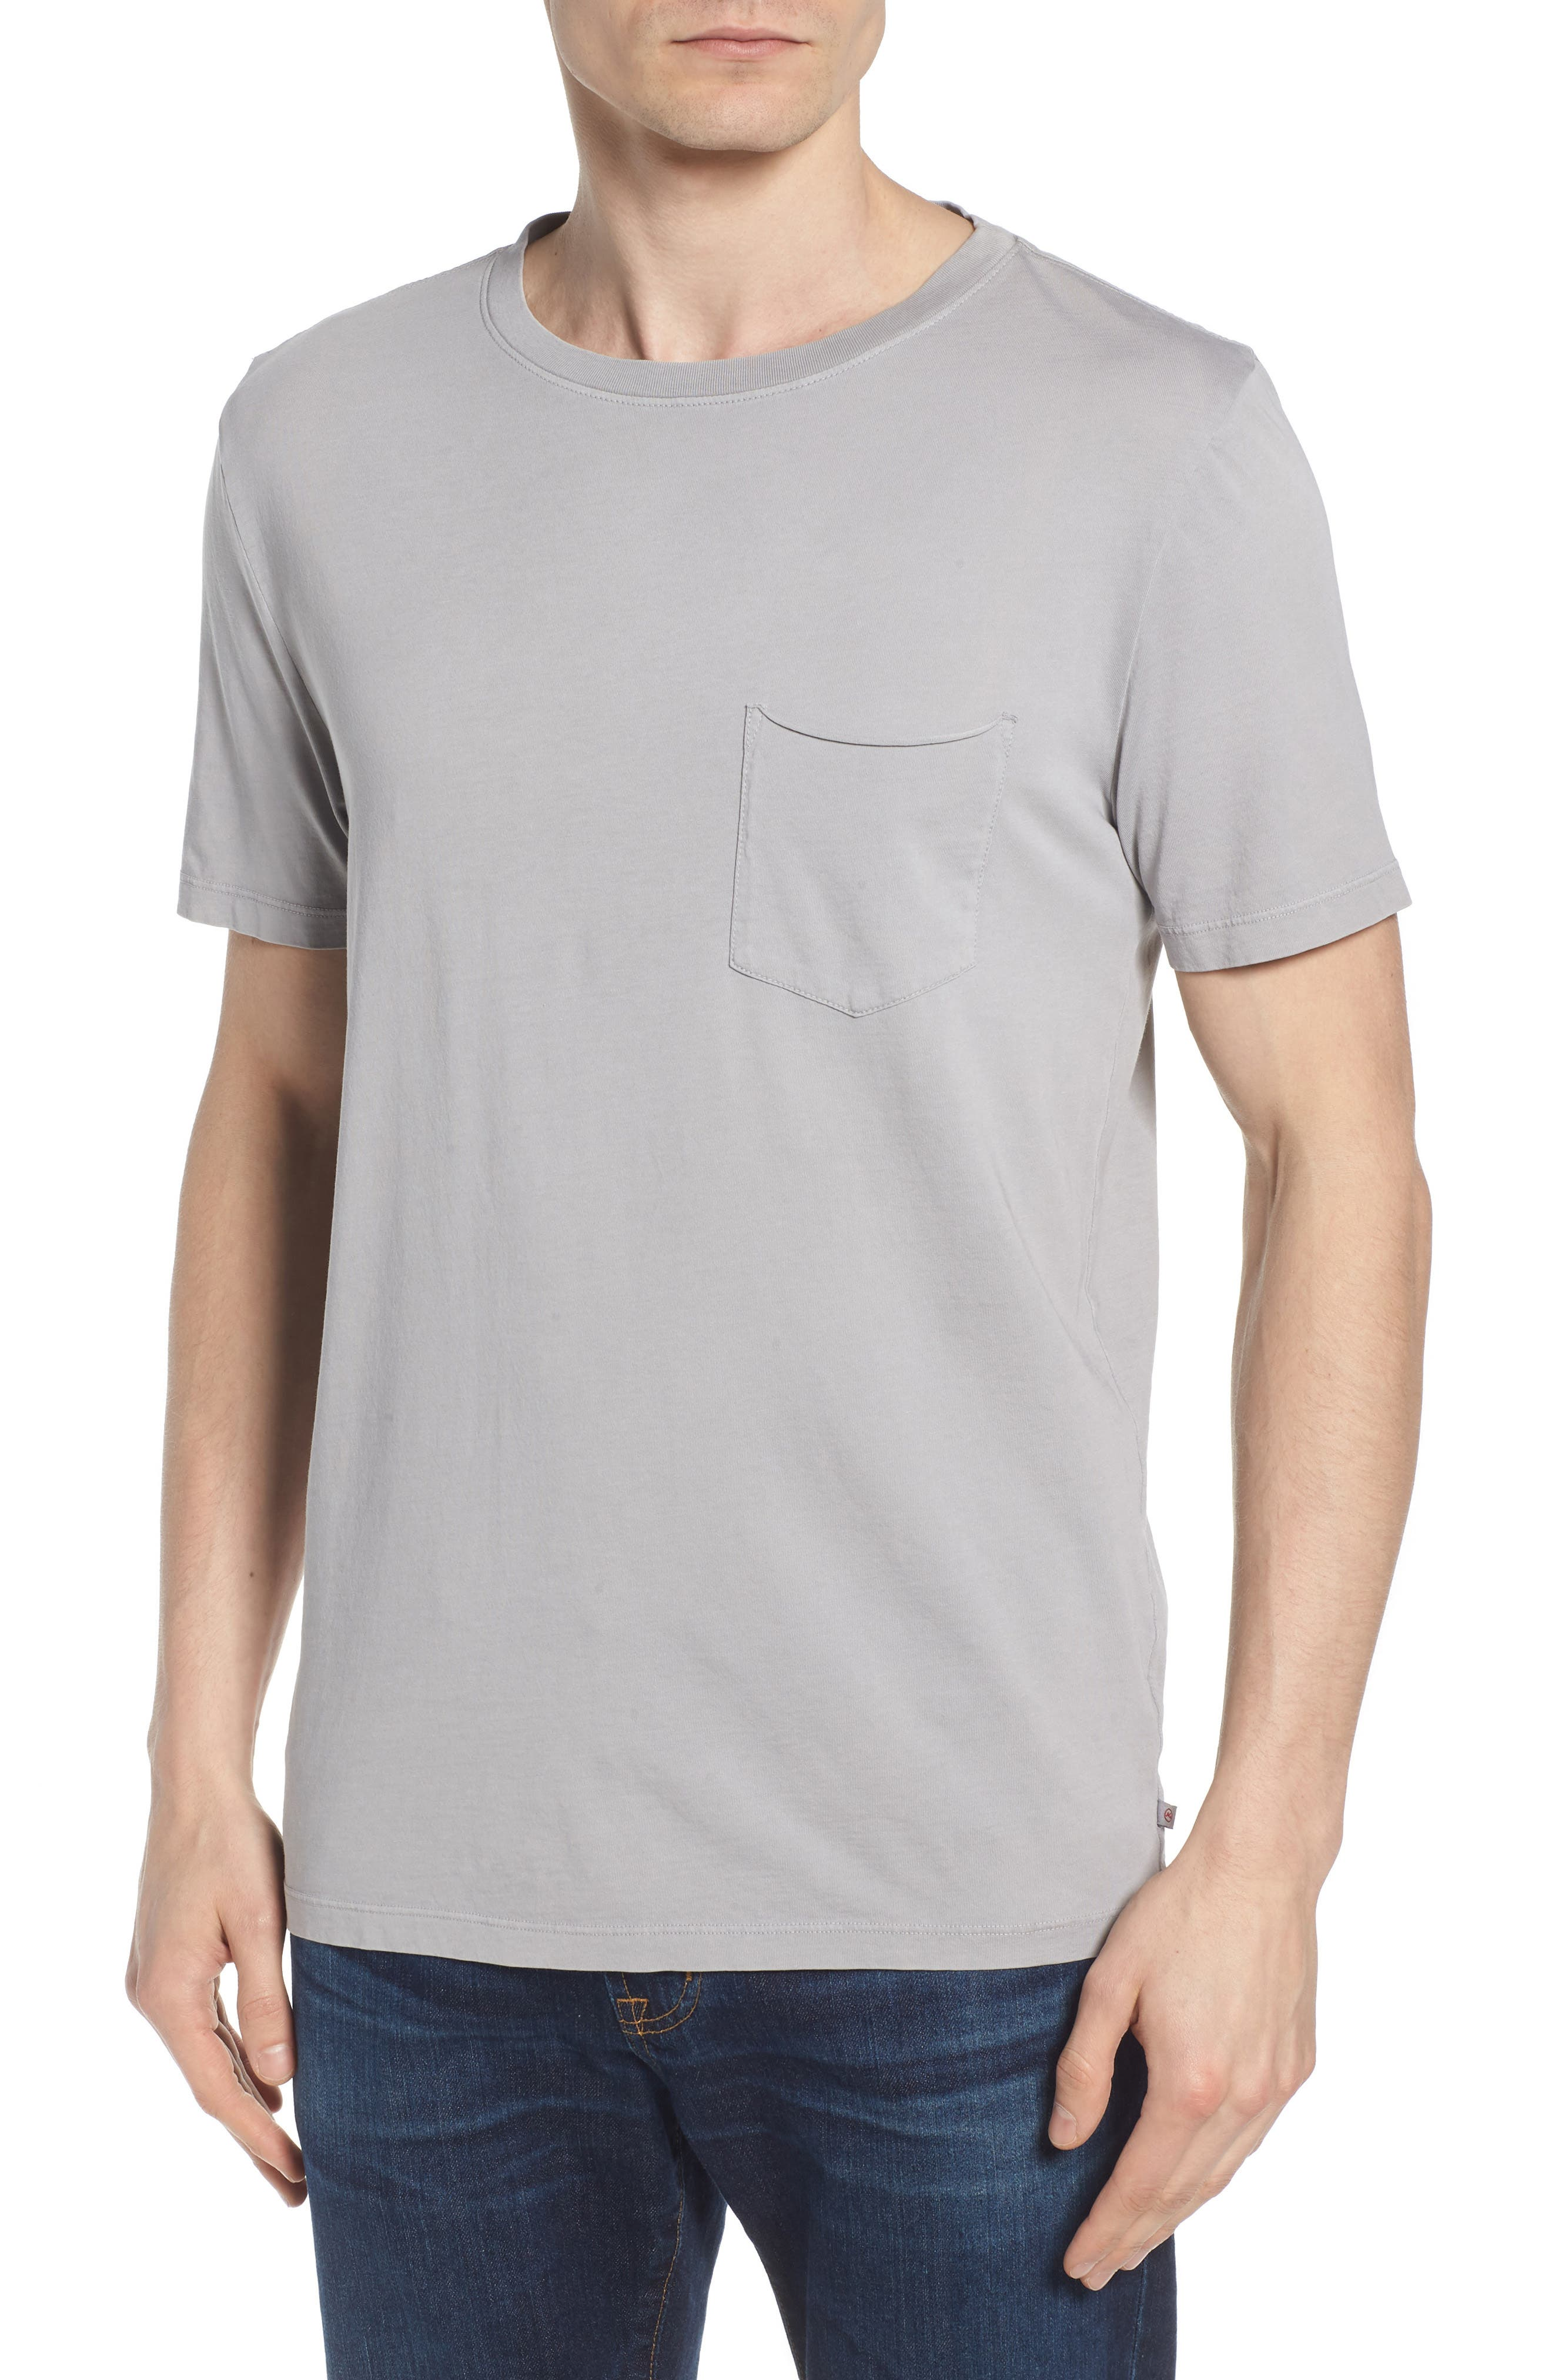 Anders Slim Fit Pocket T-Shirt,                             Main thumbnail 1, color,                             SUN FADED PEBBLE BEACH